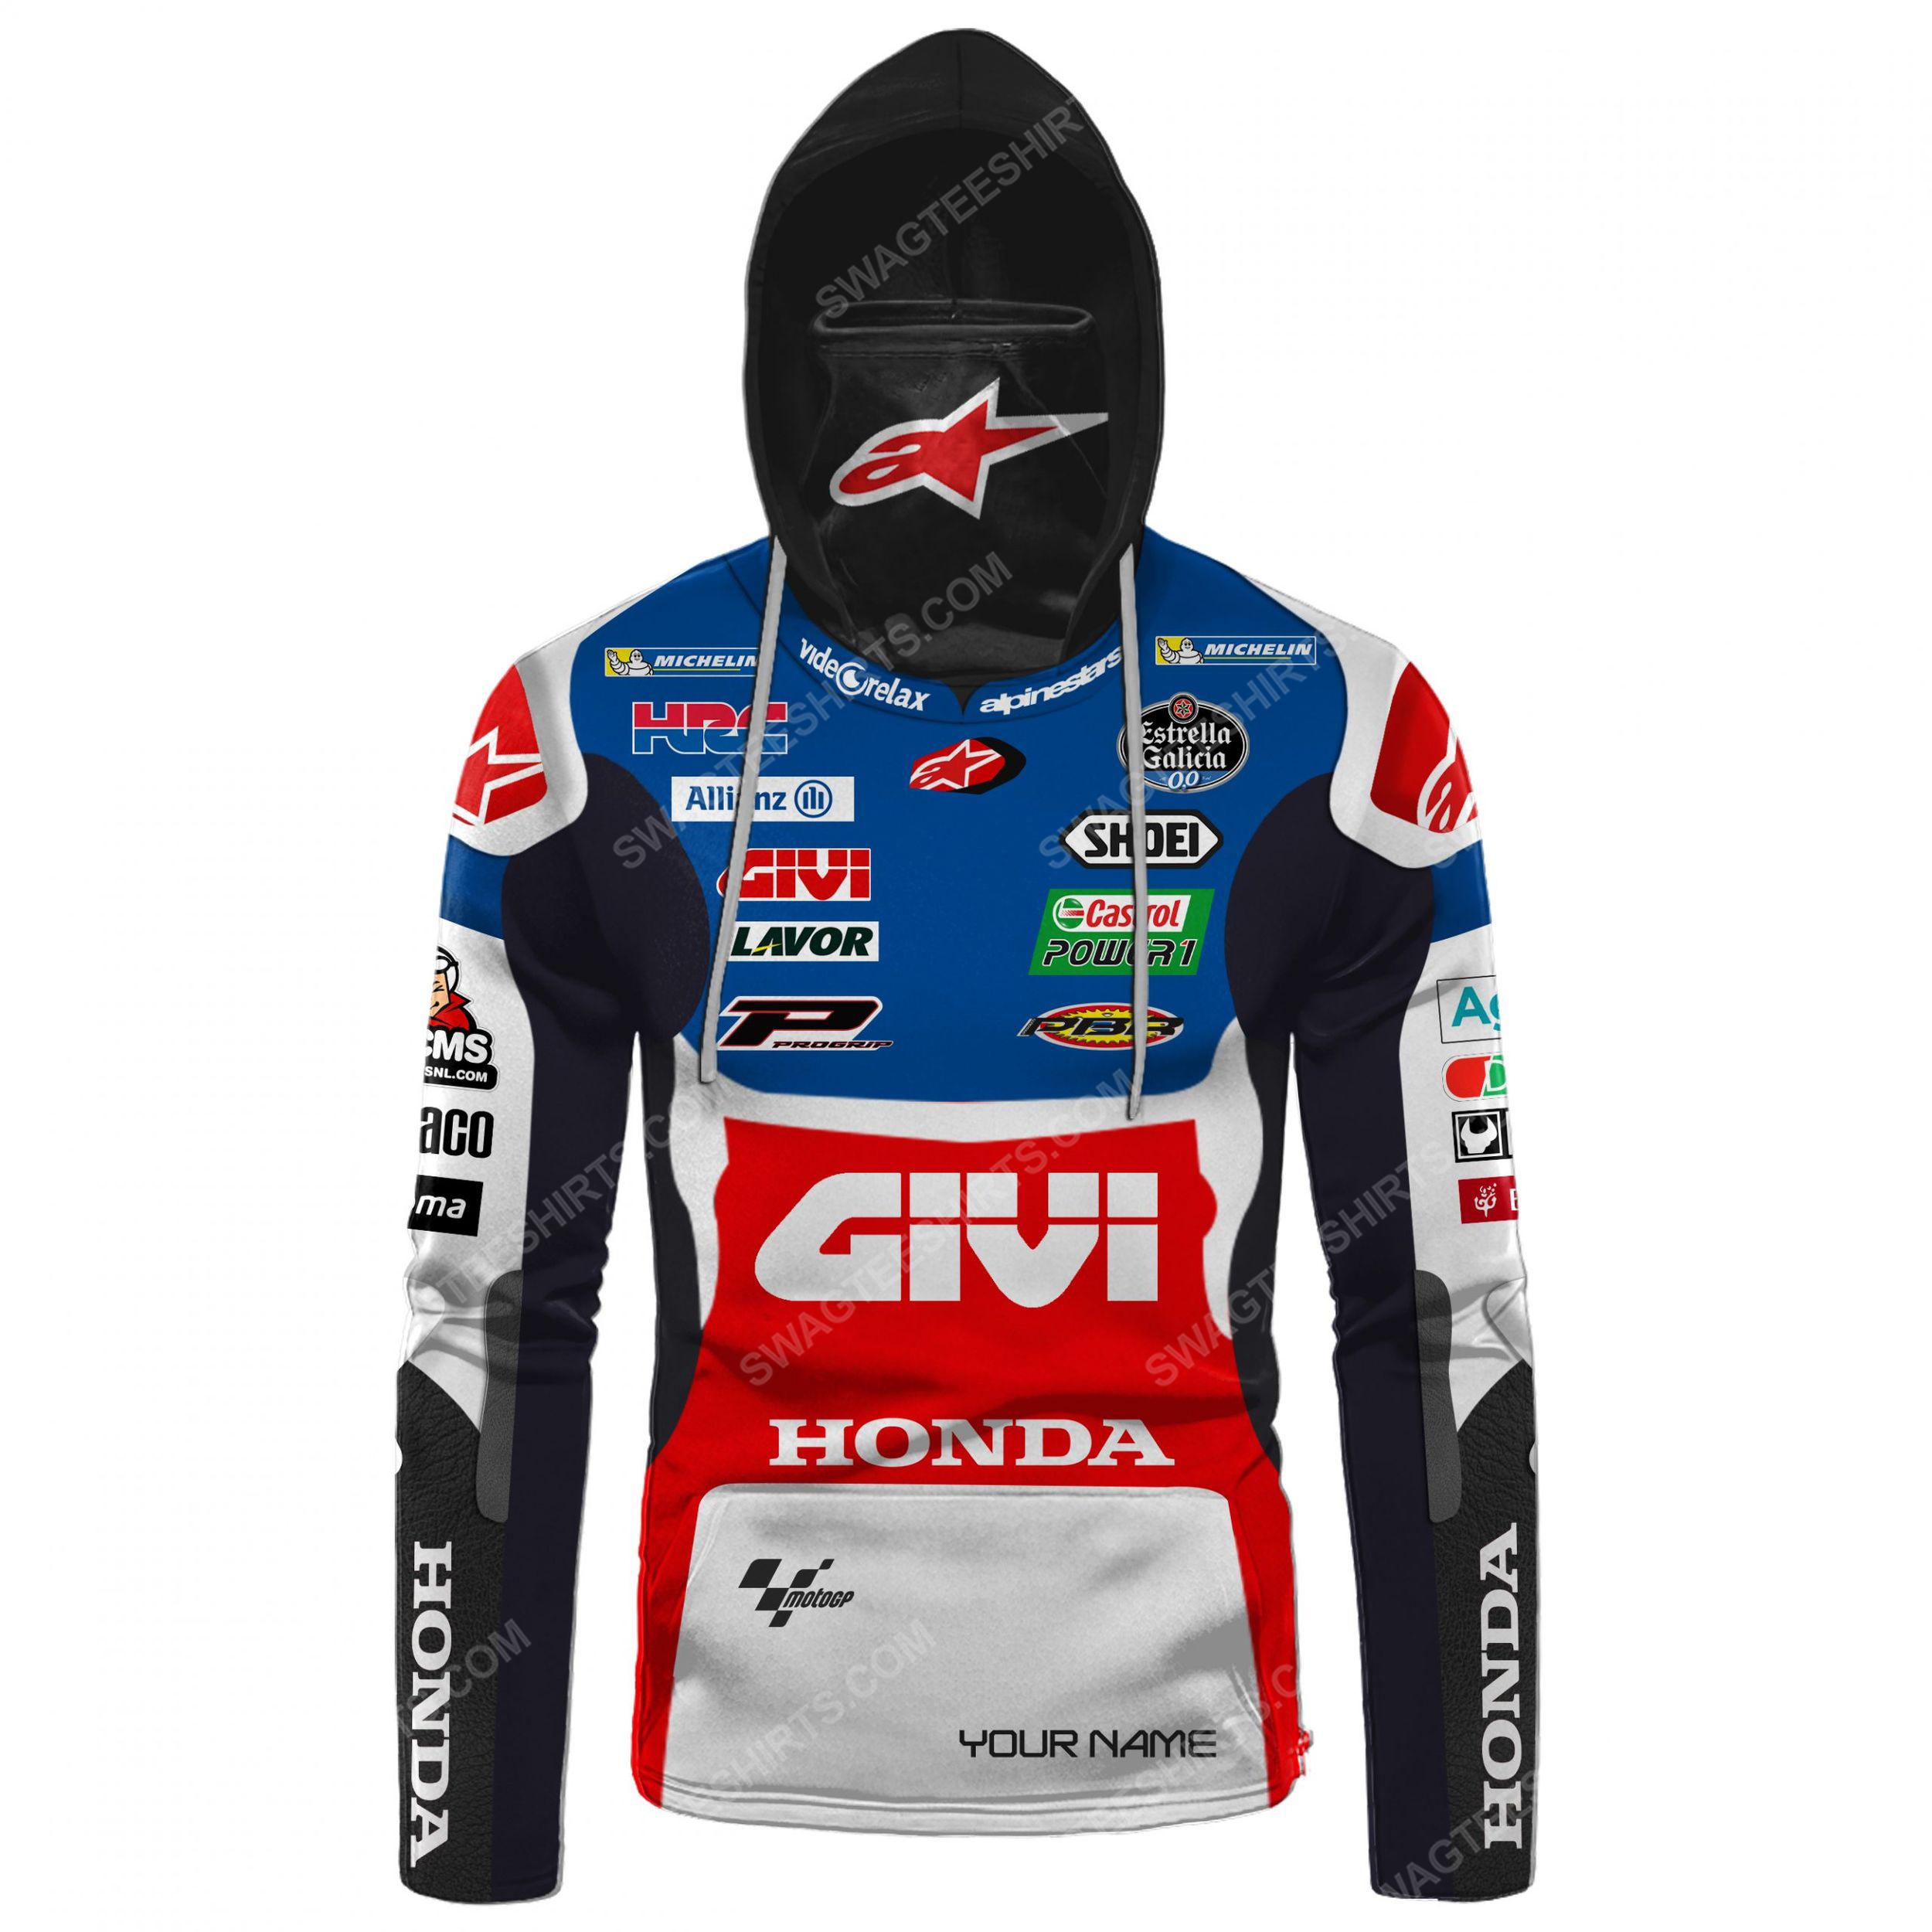 Custom name castrol power honda racing full print mask hoodie 2(1)